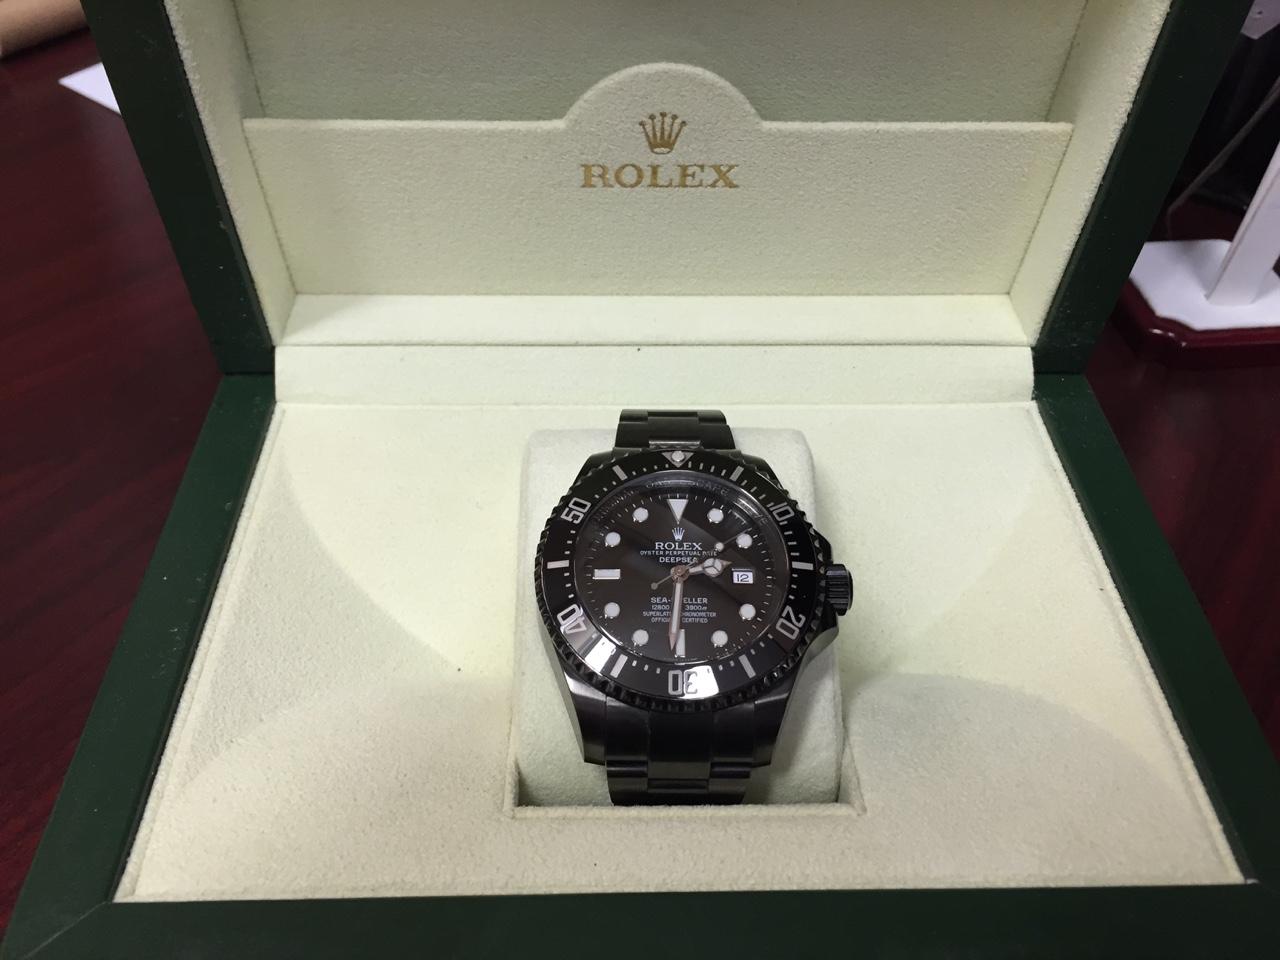 Rolex Sea-Dweller Deepsea PVD - $8,200